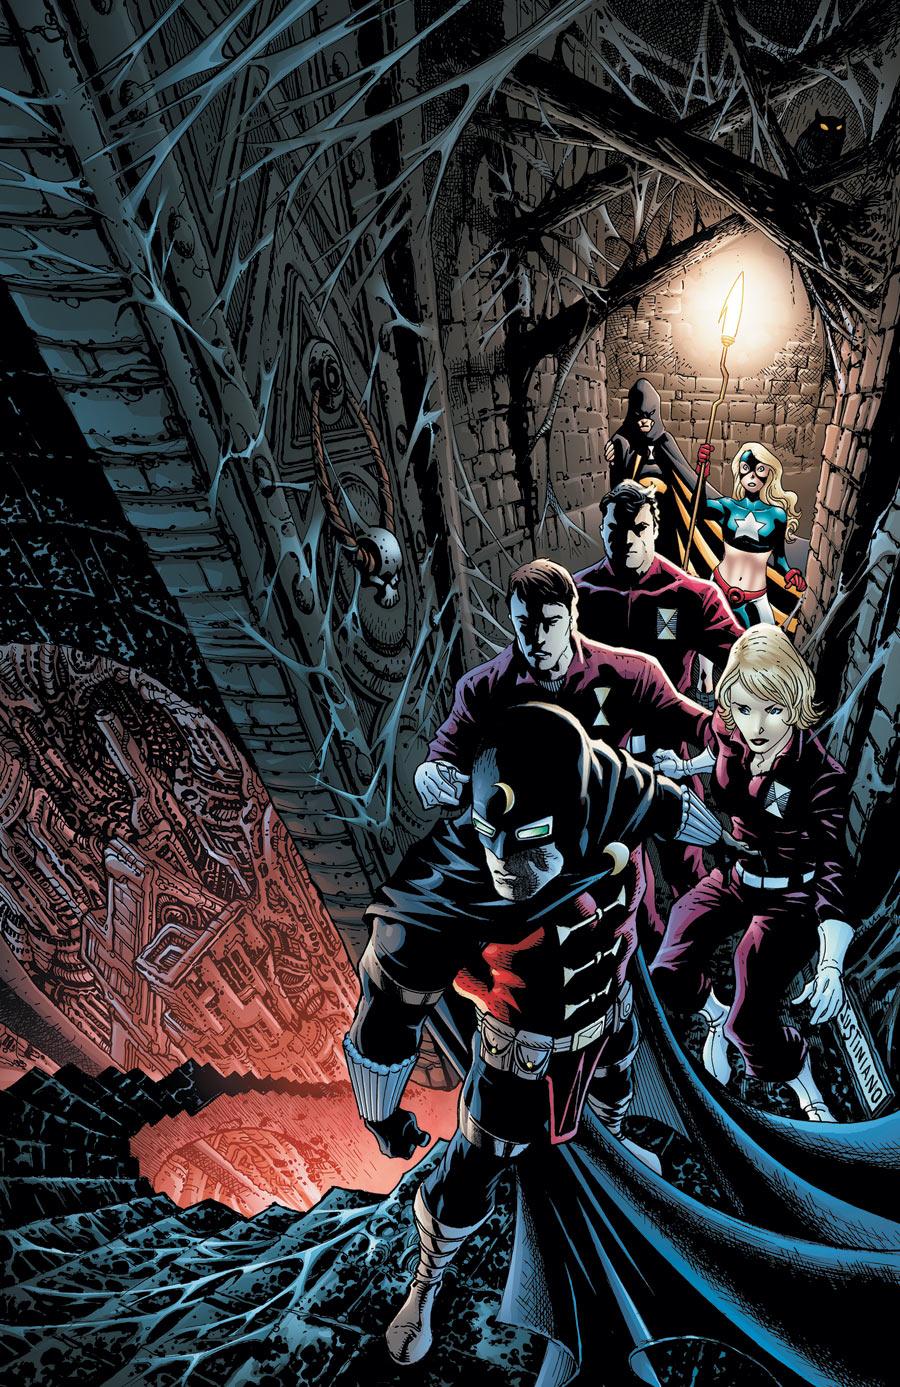 Justice Society of America Vol 3 52 Solicit.jpg